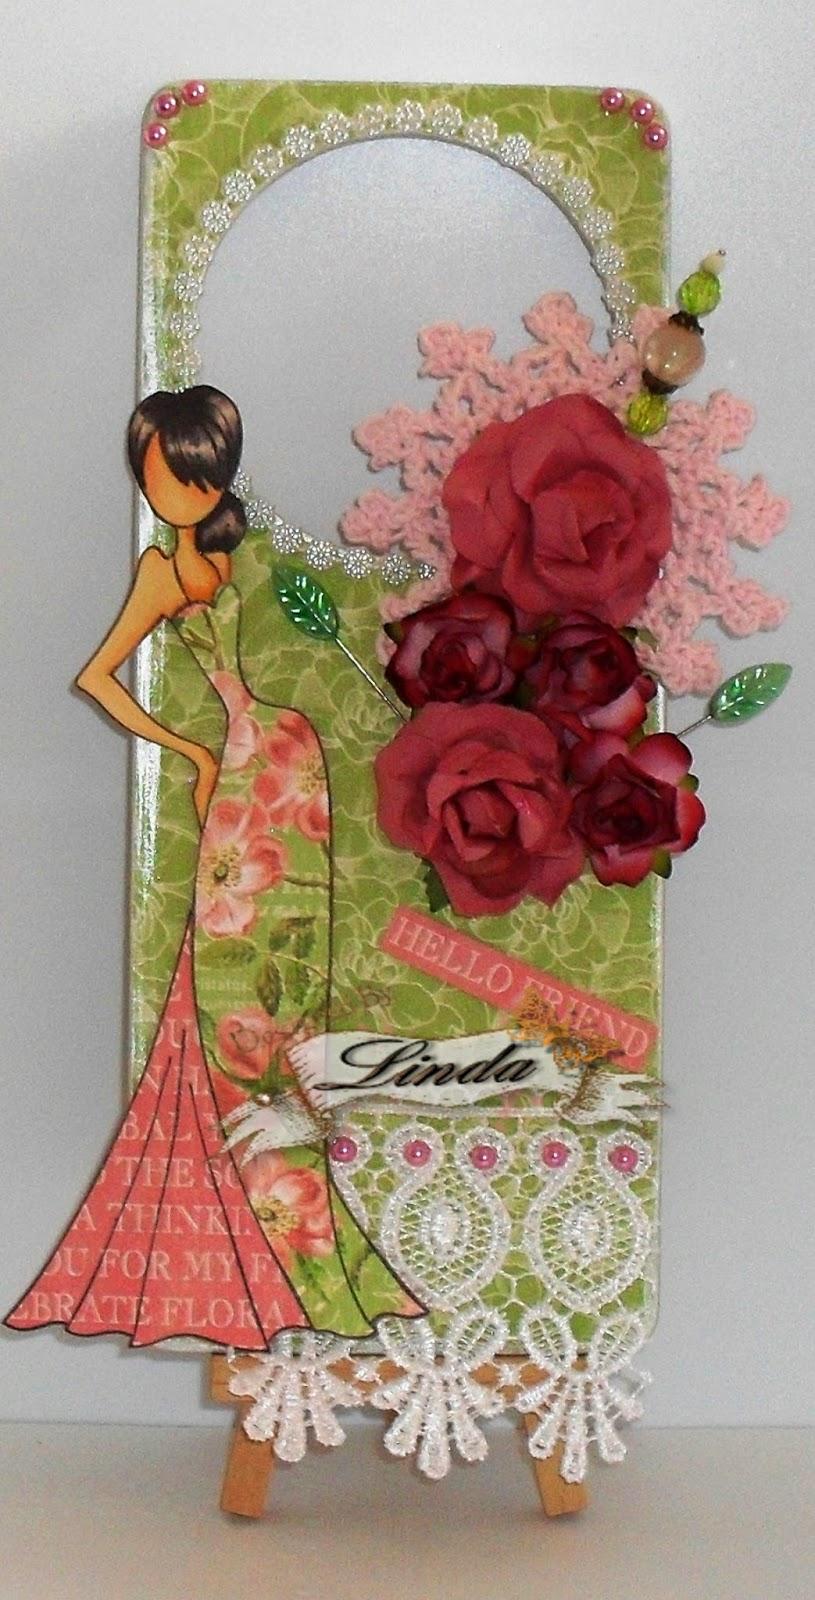 Linda's Crafty Piece of Heaven: Tasha - Julie Nutting ...